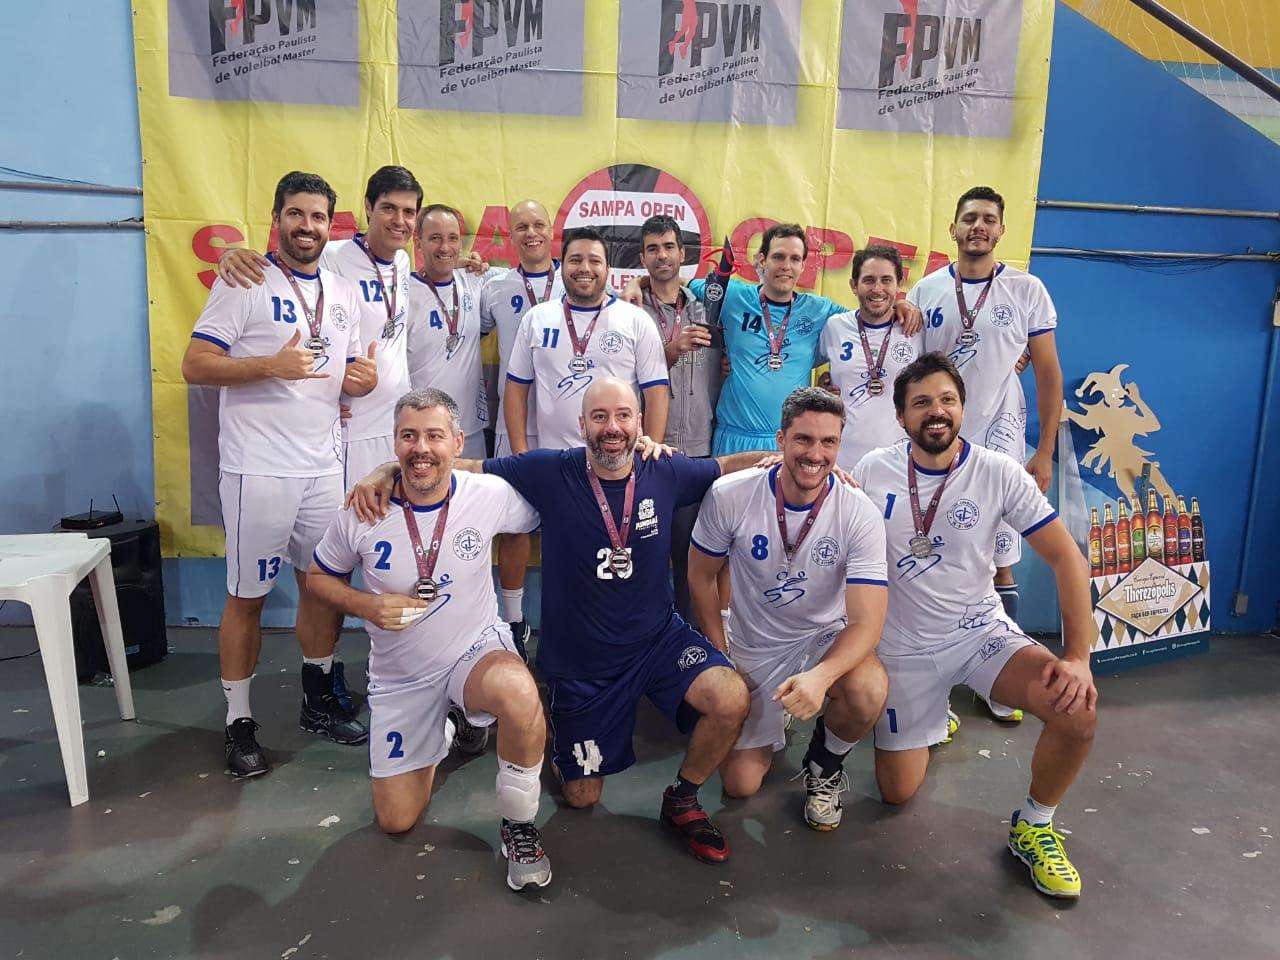 35+ Em pé: MOLEZA (13), ROGERIÃO (12), VANDE (4), DAIVI (9), MOCOTÓ (11), FABIANO (de cinza), Felipe Rappa (14), TORSO (3) e MULLER (16) Agachados, da esquerda para a direita: PADOCA (2), GOIANO (25), ROVERI (8) E MARLON (1)